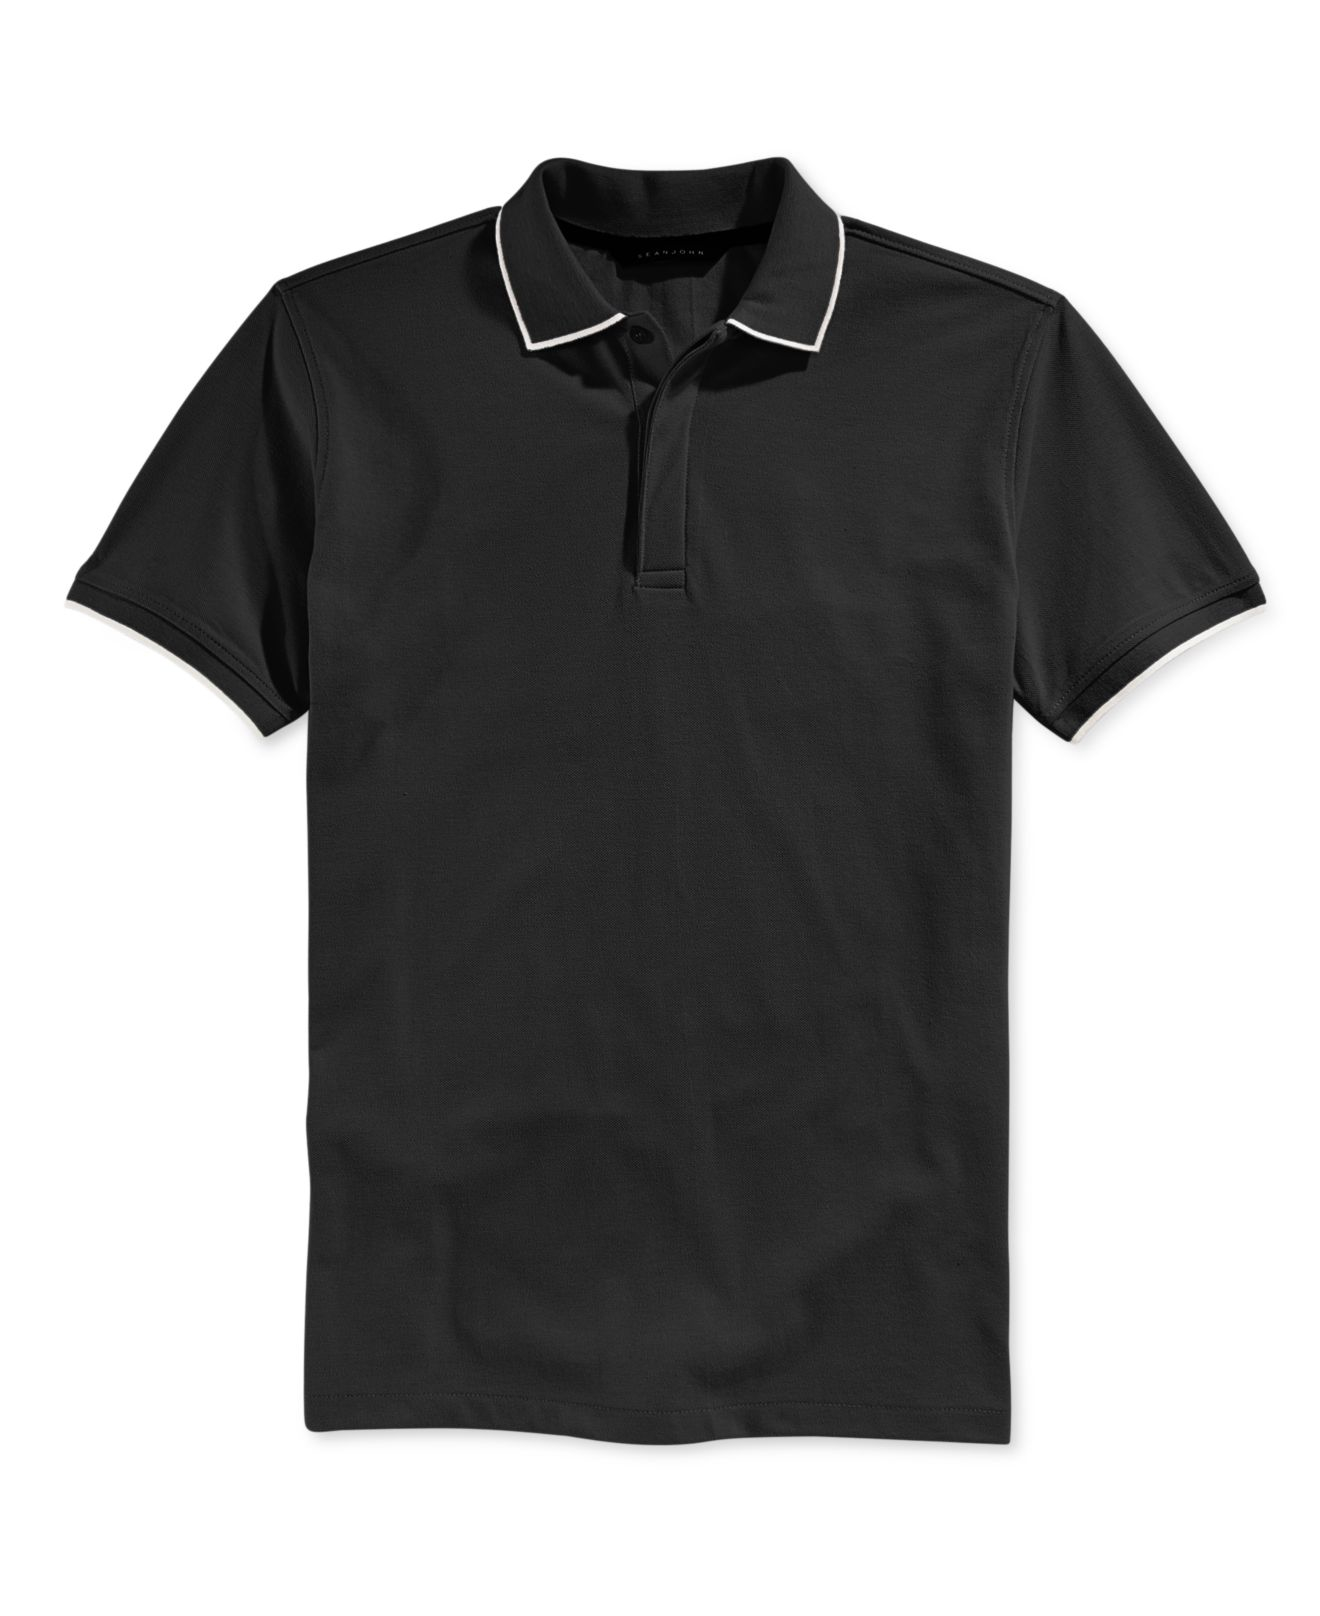 Lyst sean john men 39 s solid core polo in black for men for Sean john t shirts for mens